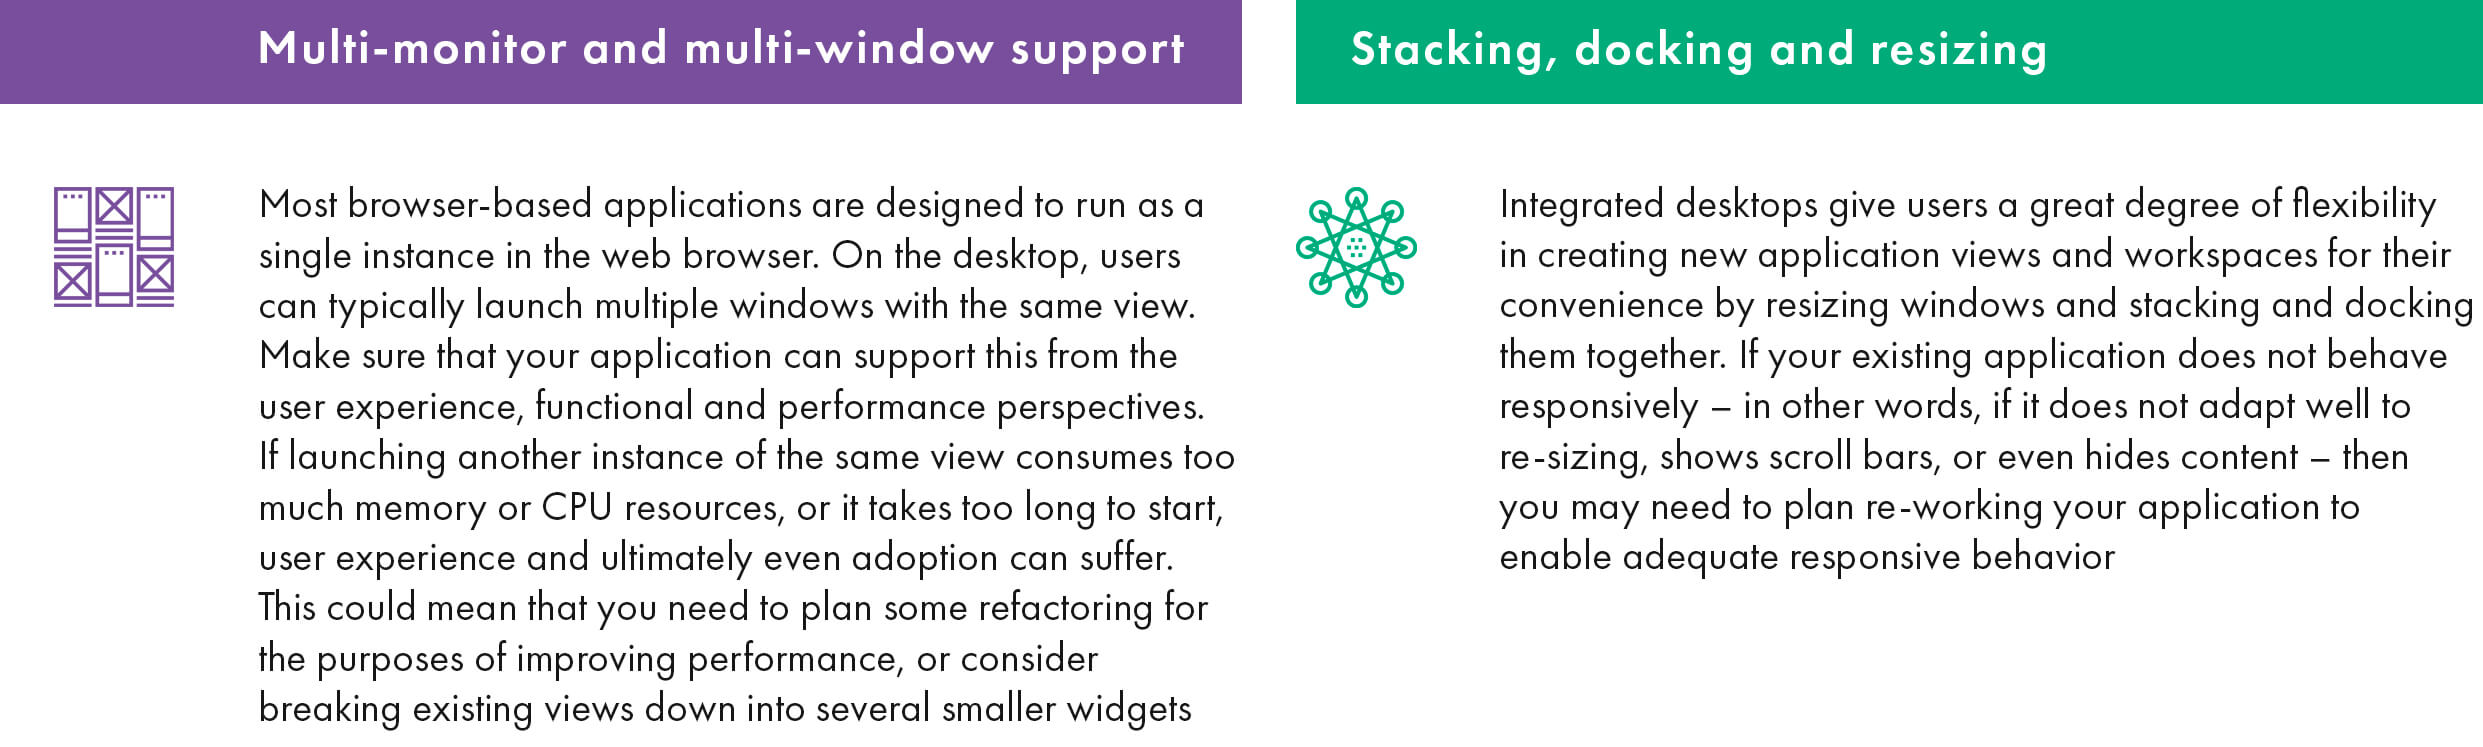 Desktop-native elements to be supported on integrated desktop